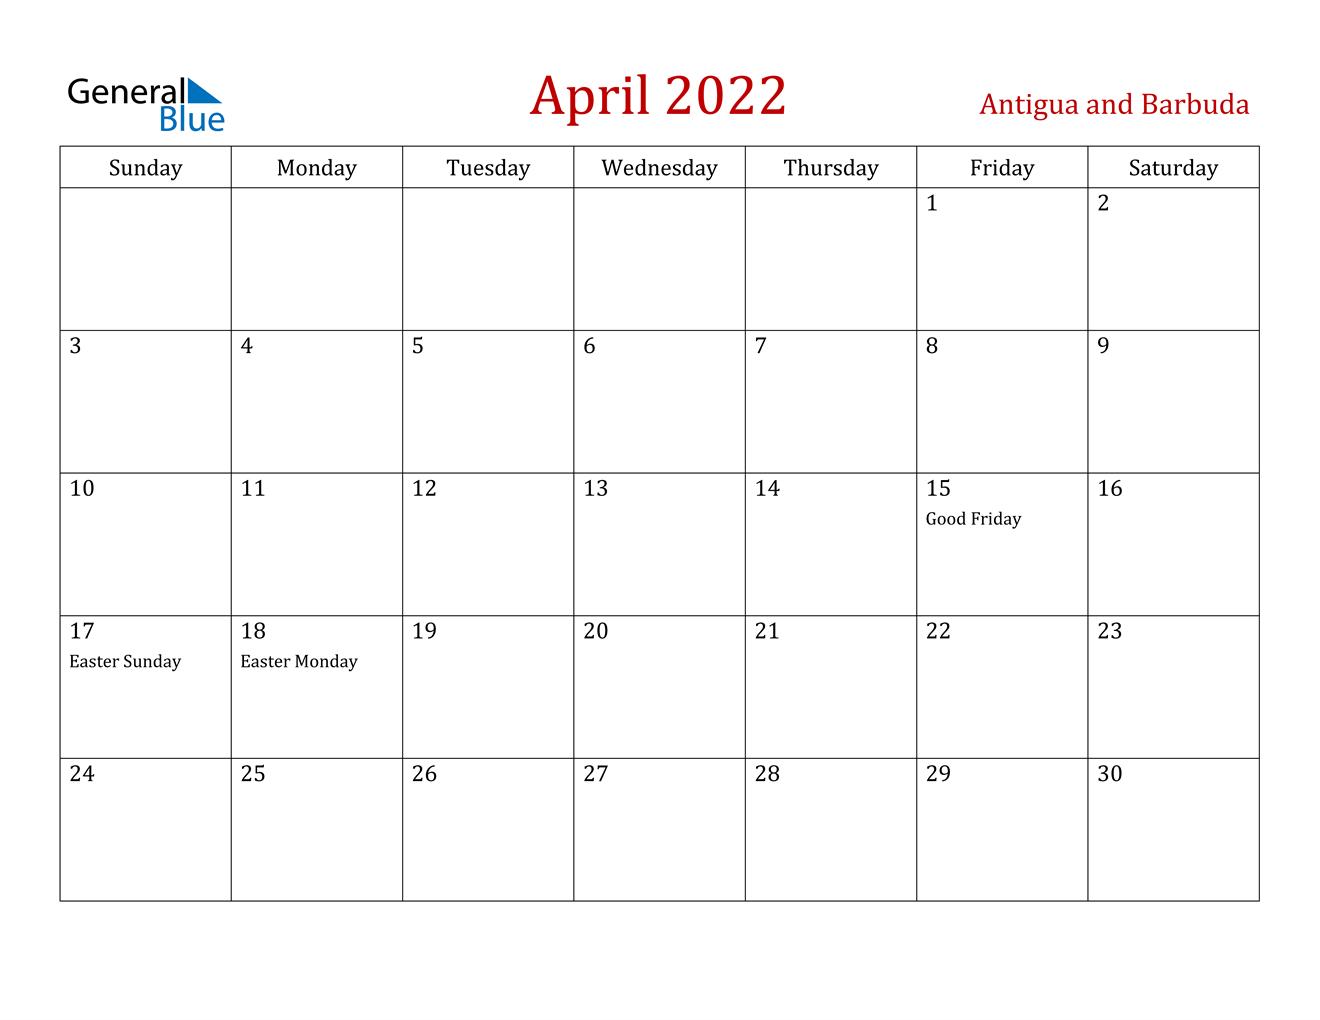 April 2022 Calendar - Antigua And Barbuda pertaining to April 2022 Printable Calendar Free 2022